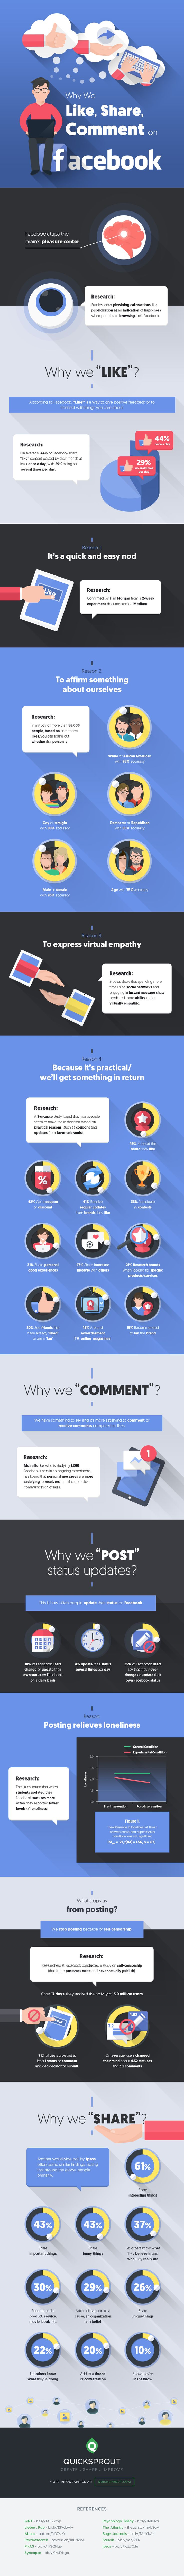 compartir me gusta infografia